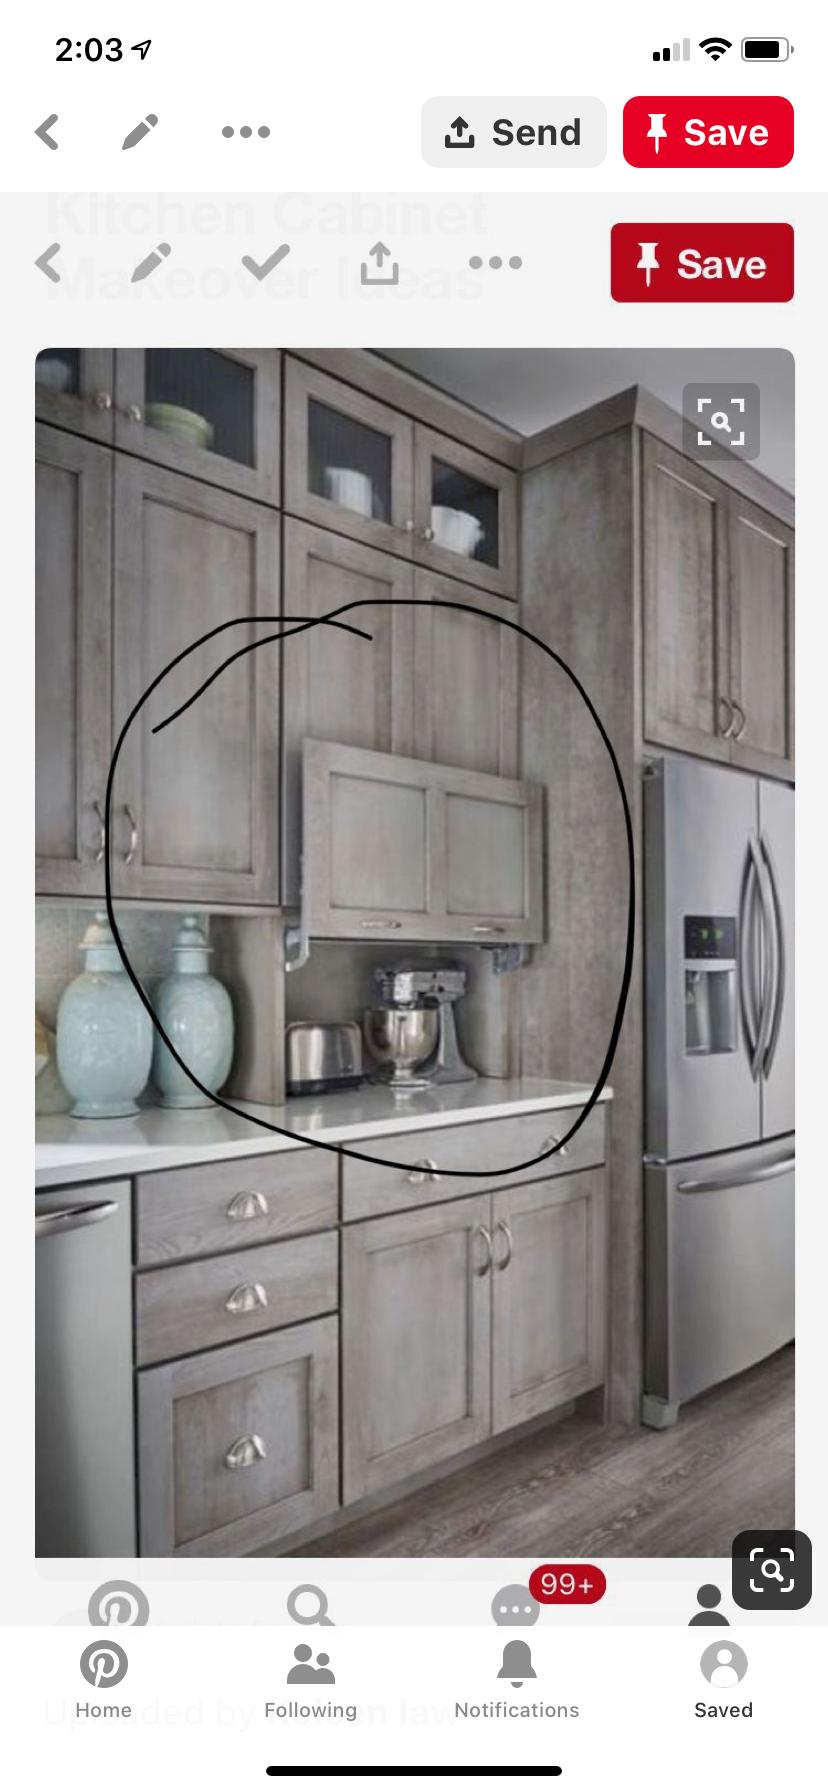 Hidden Storage Clean Countertops With Images Diy Kitchen Cabinets Kitchen Remodel Kitchen